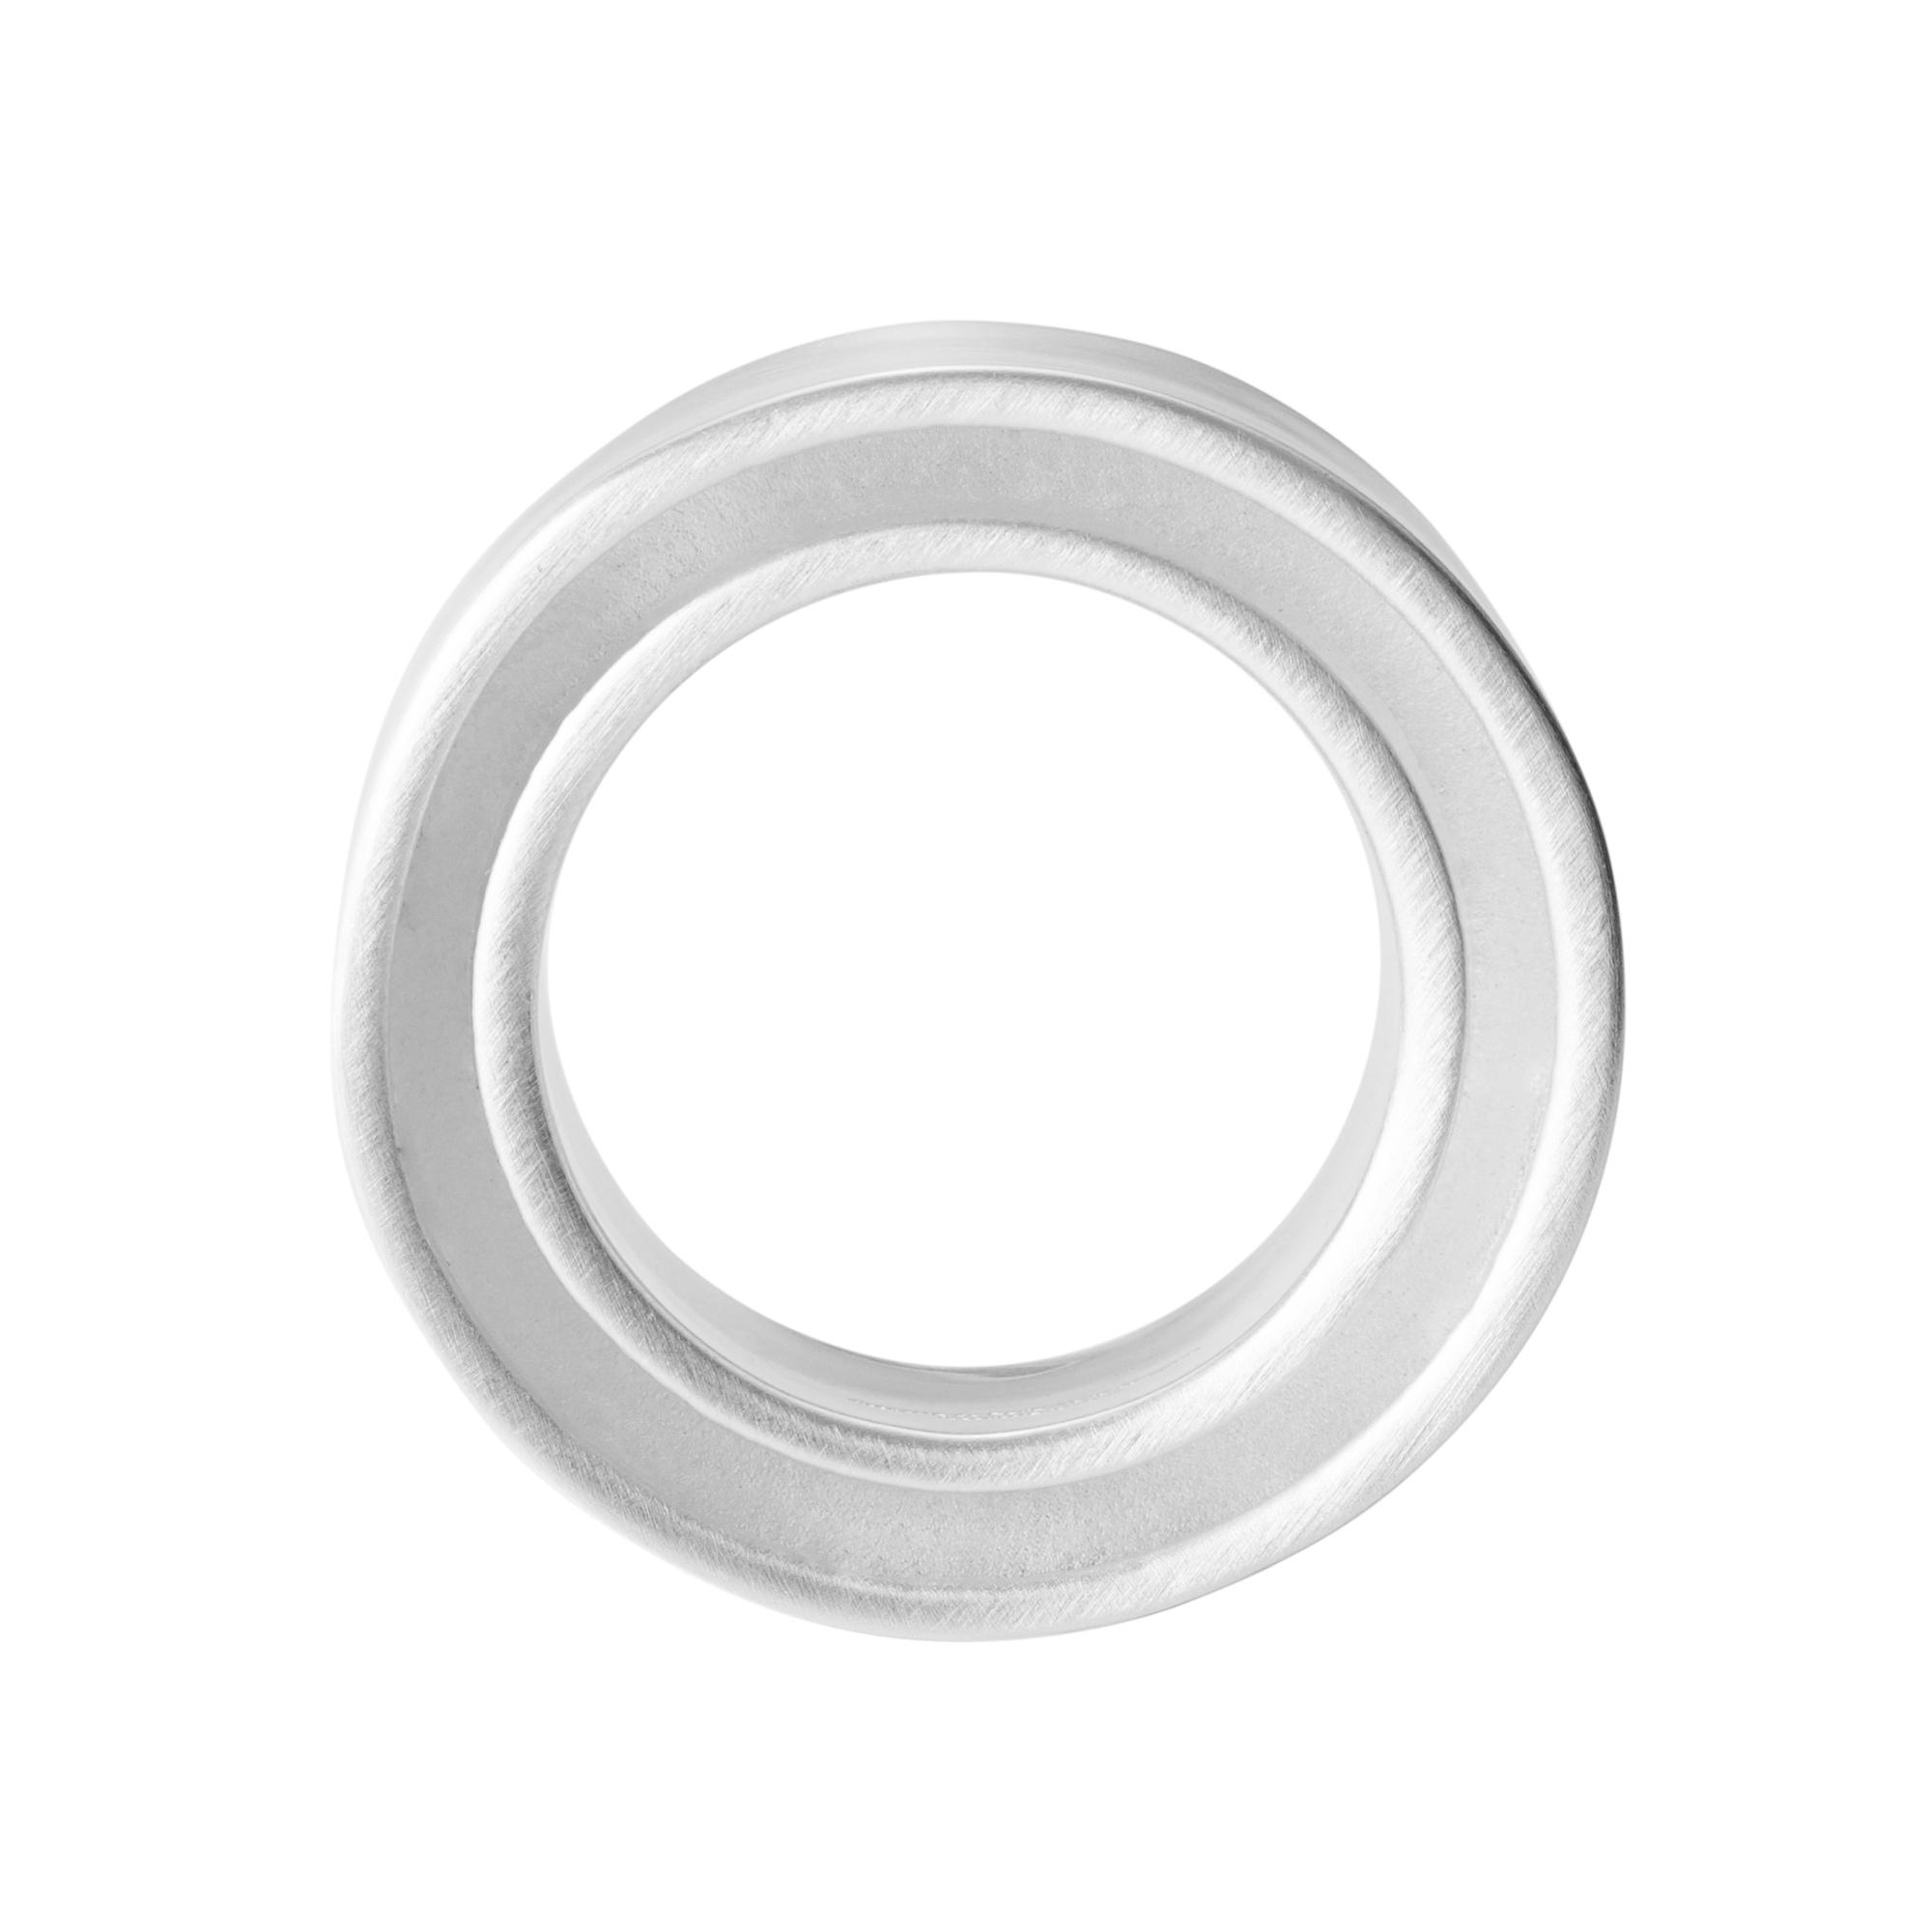 ipn_extra_wide_ring_silver_1.jpg